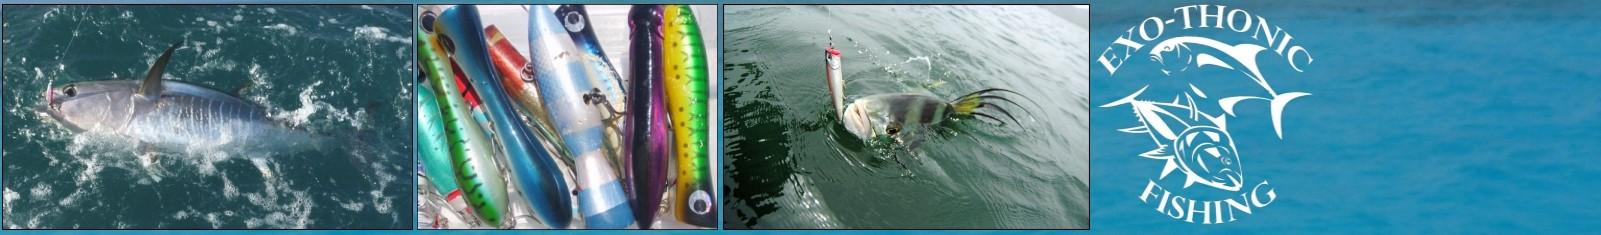 EXO-THONIC FISHING